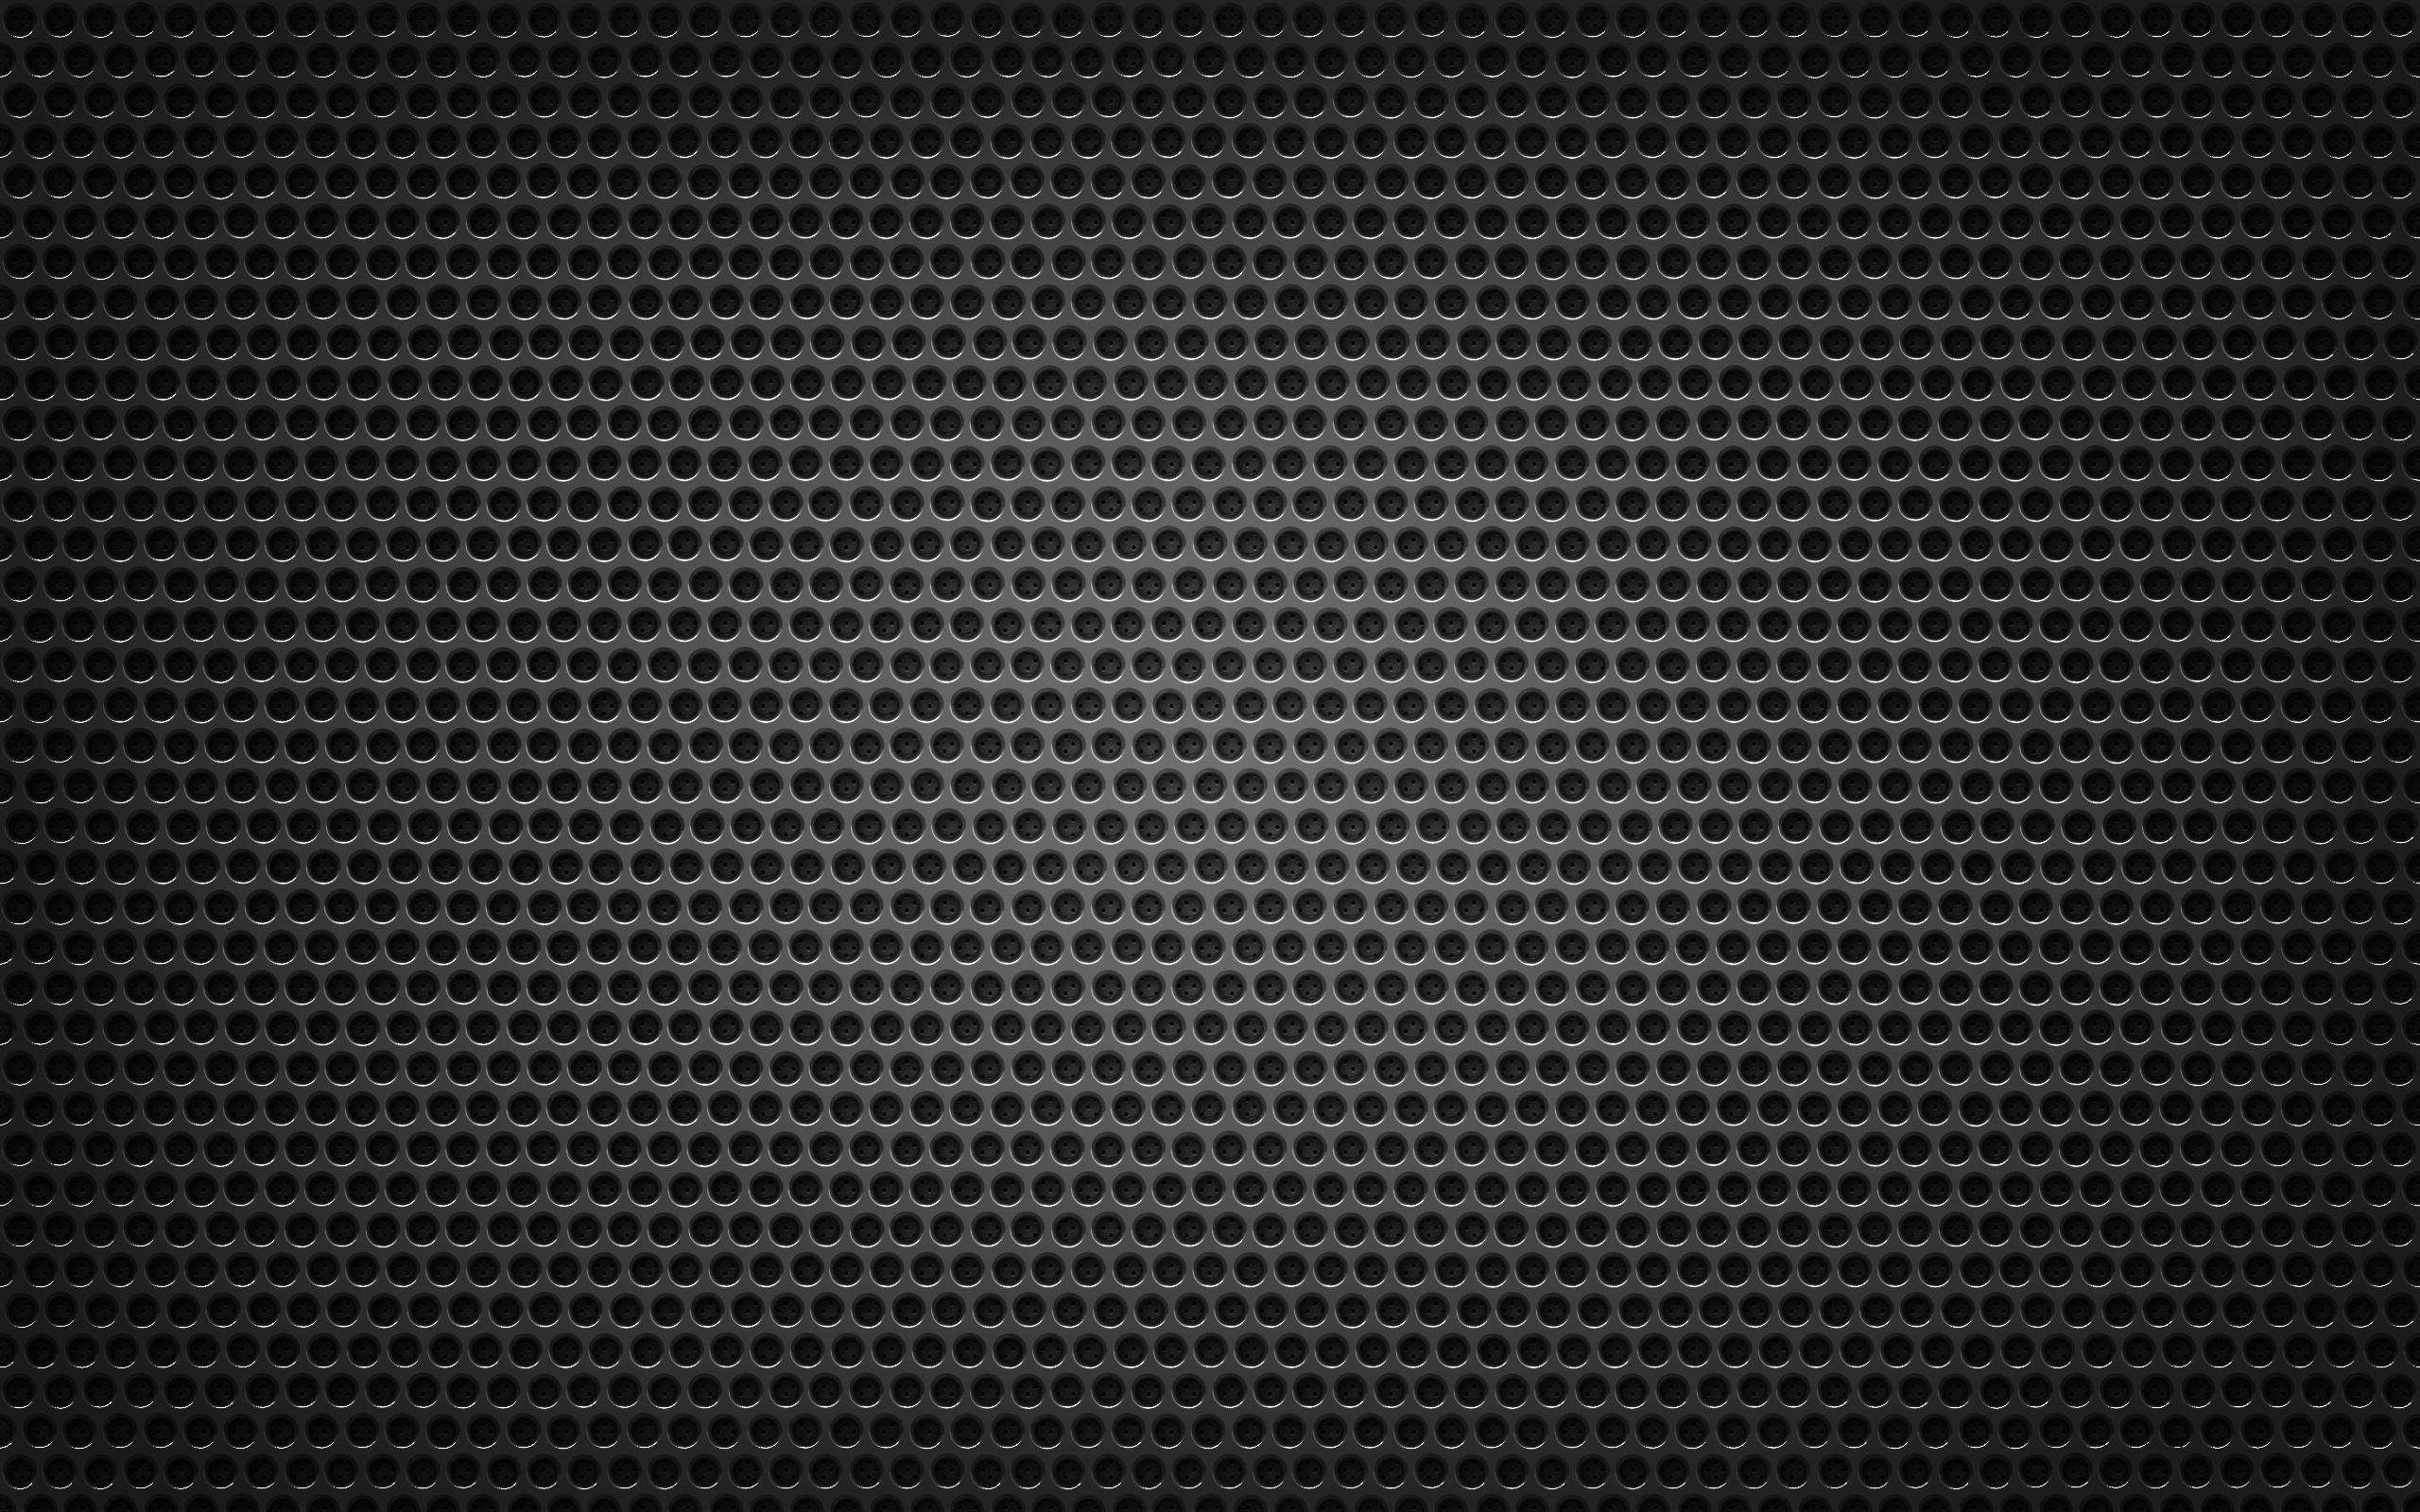 Texture texture mesh chain metal ornaments wallpaper 2560x1600